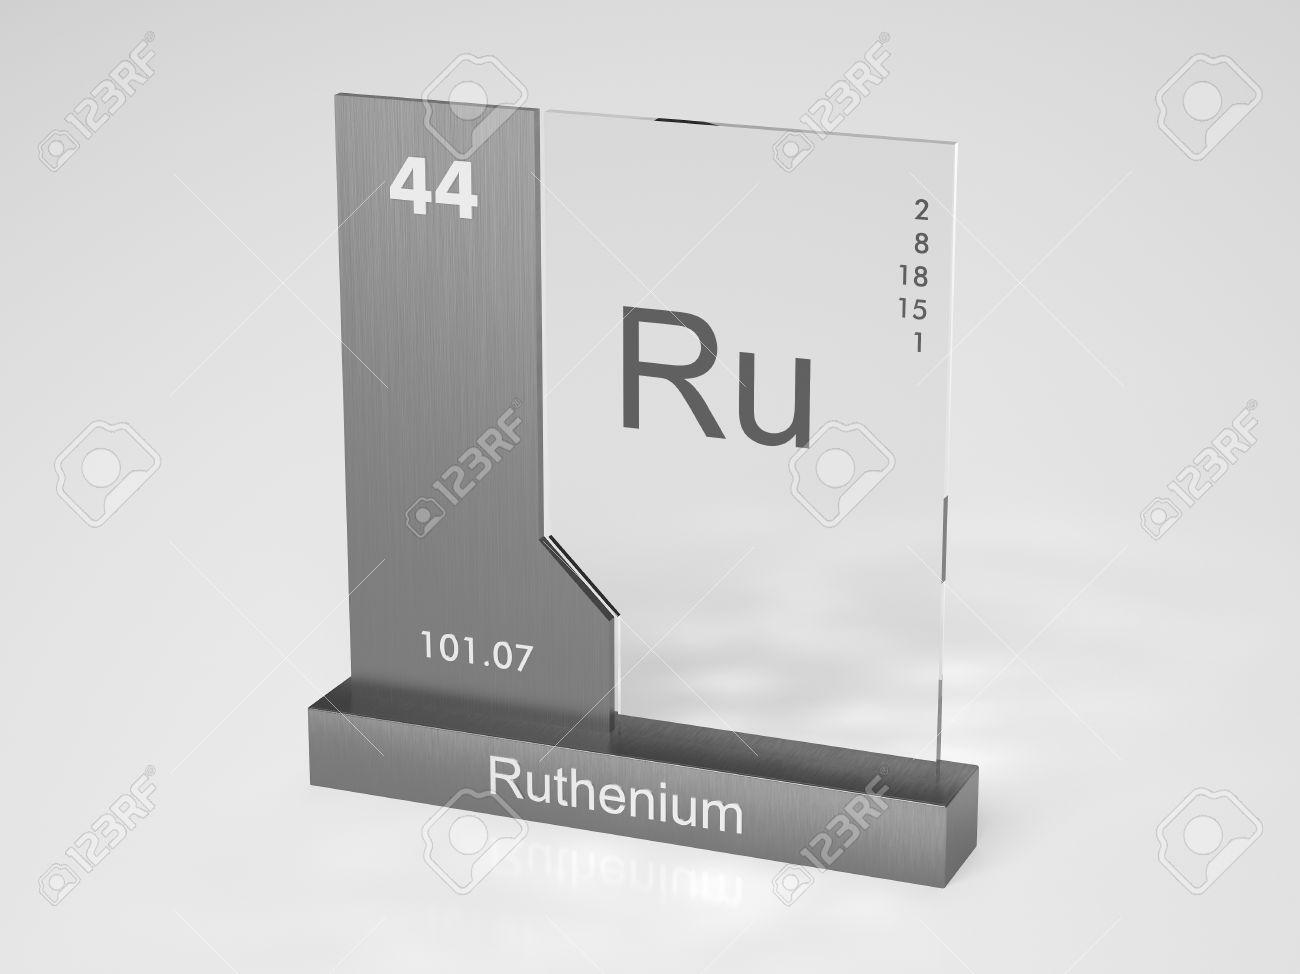 Ruthenium Symbol Ru Chemical Element Of The Periodic Table Stock